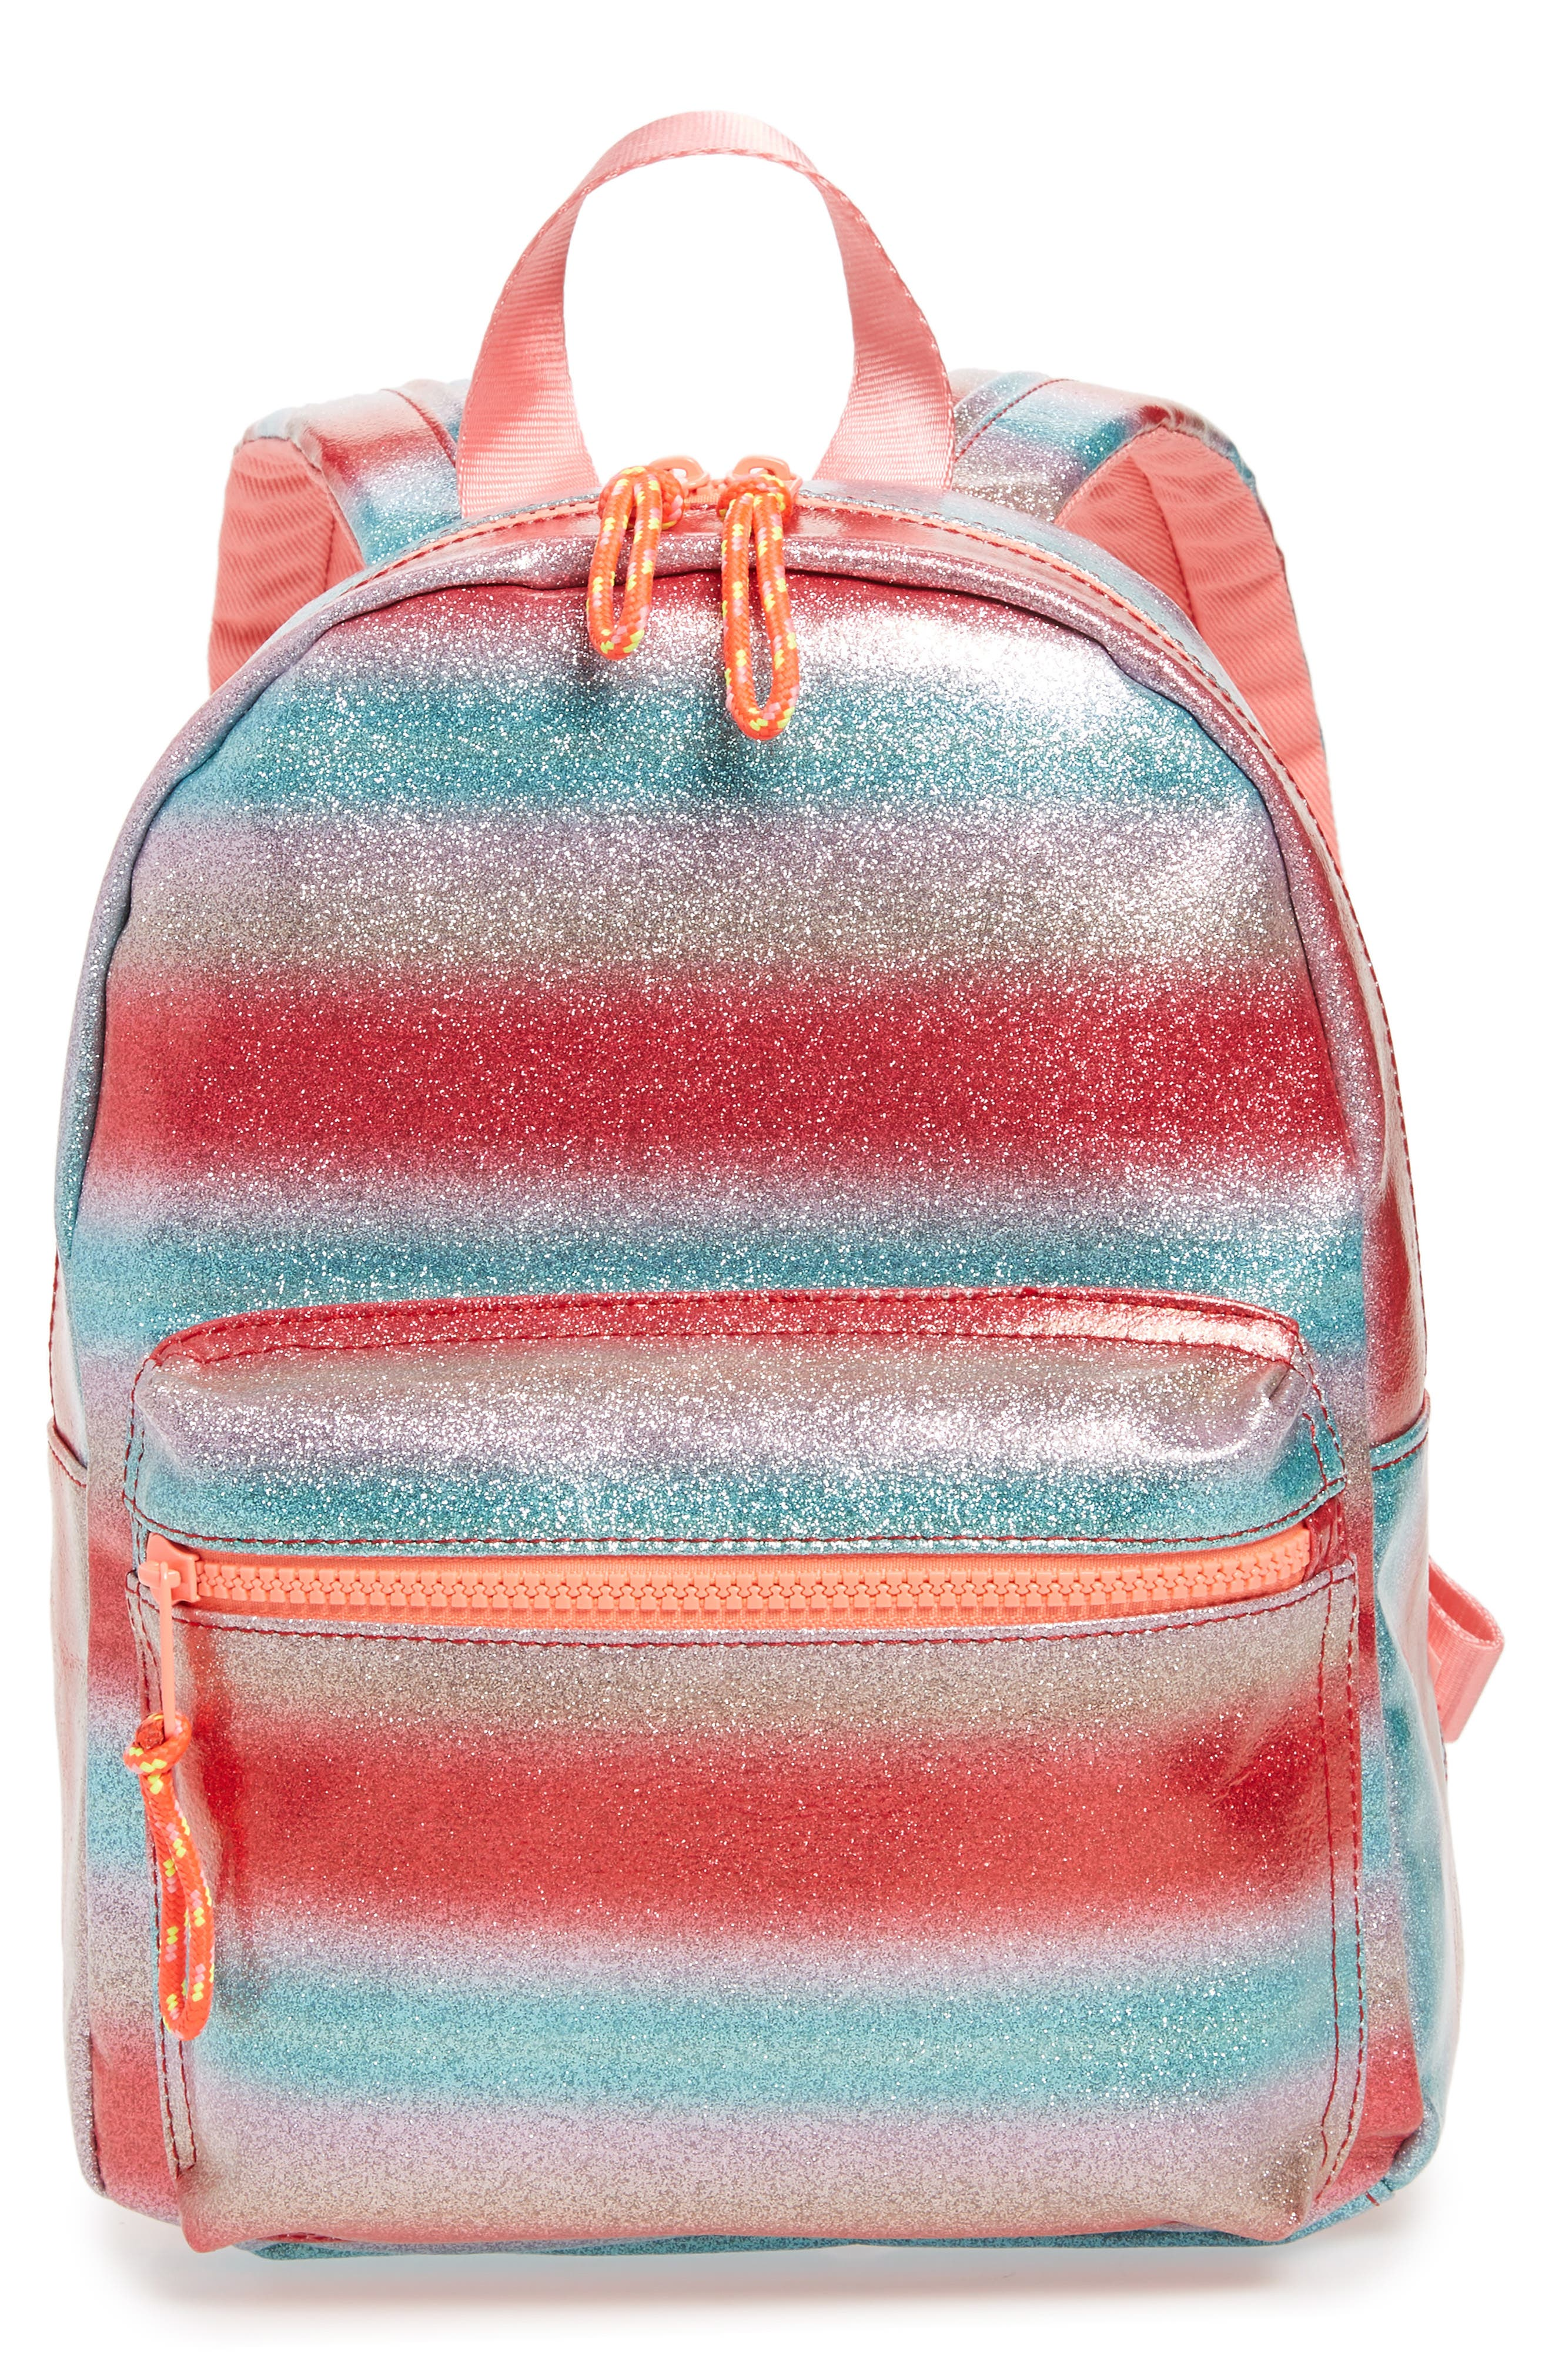 Glitter Mini Backpack,                             Main thumbnail 1, color,                             RAINBOW